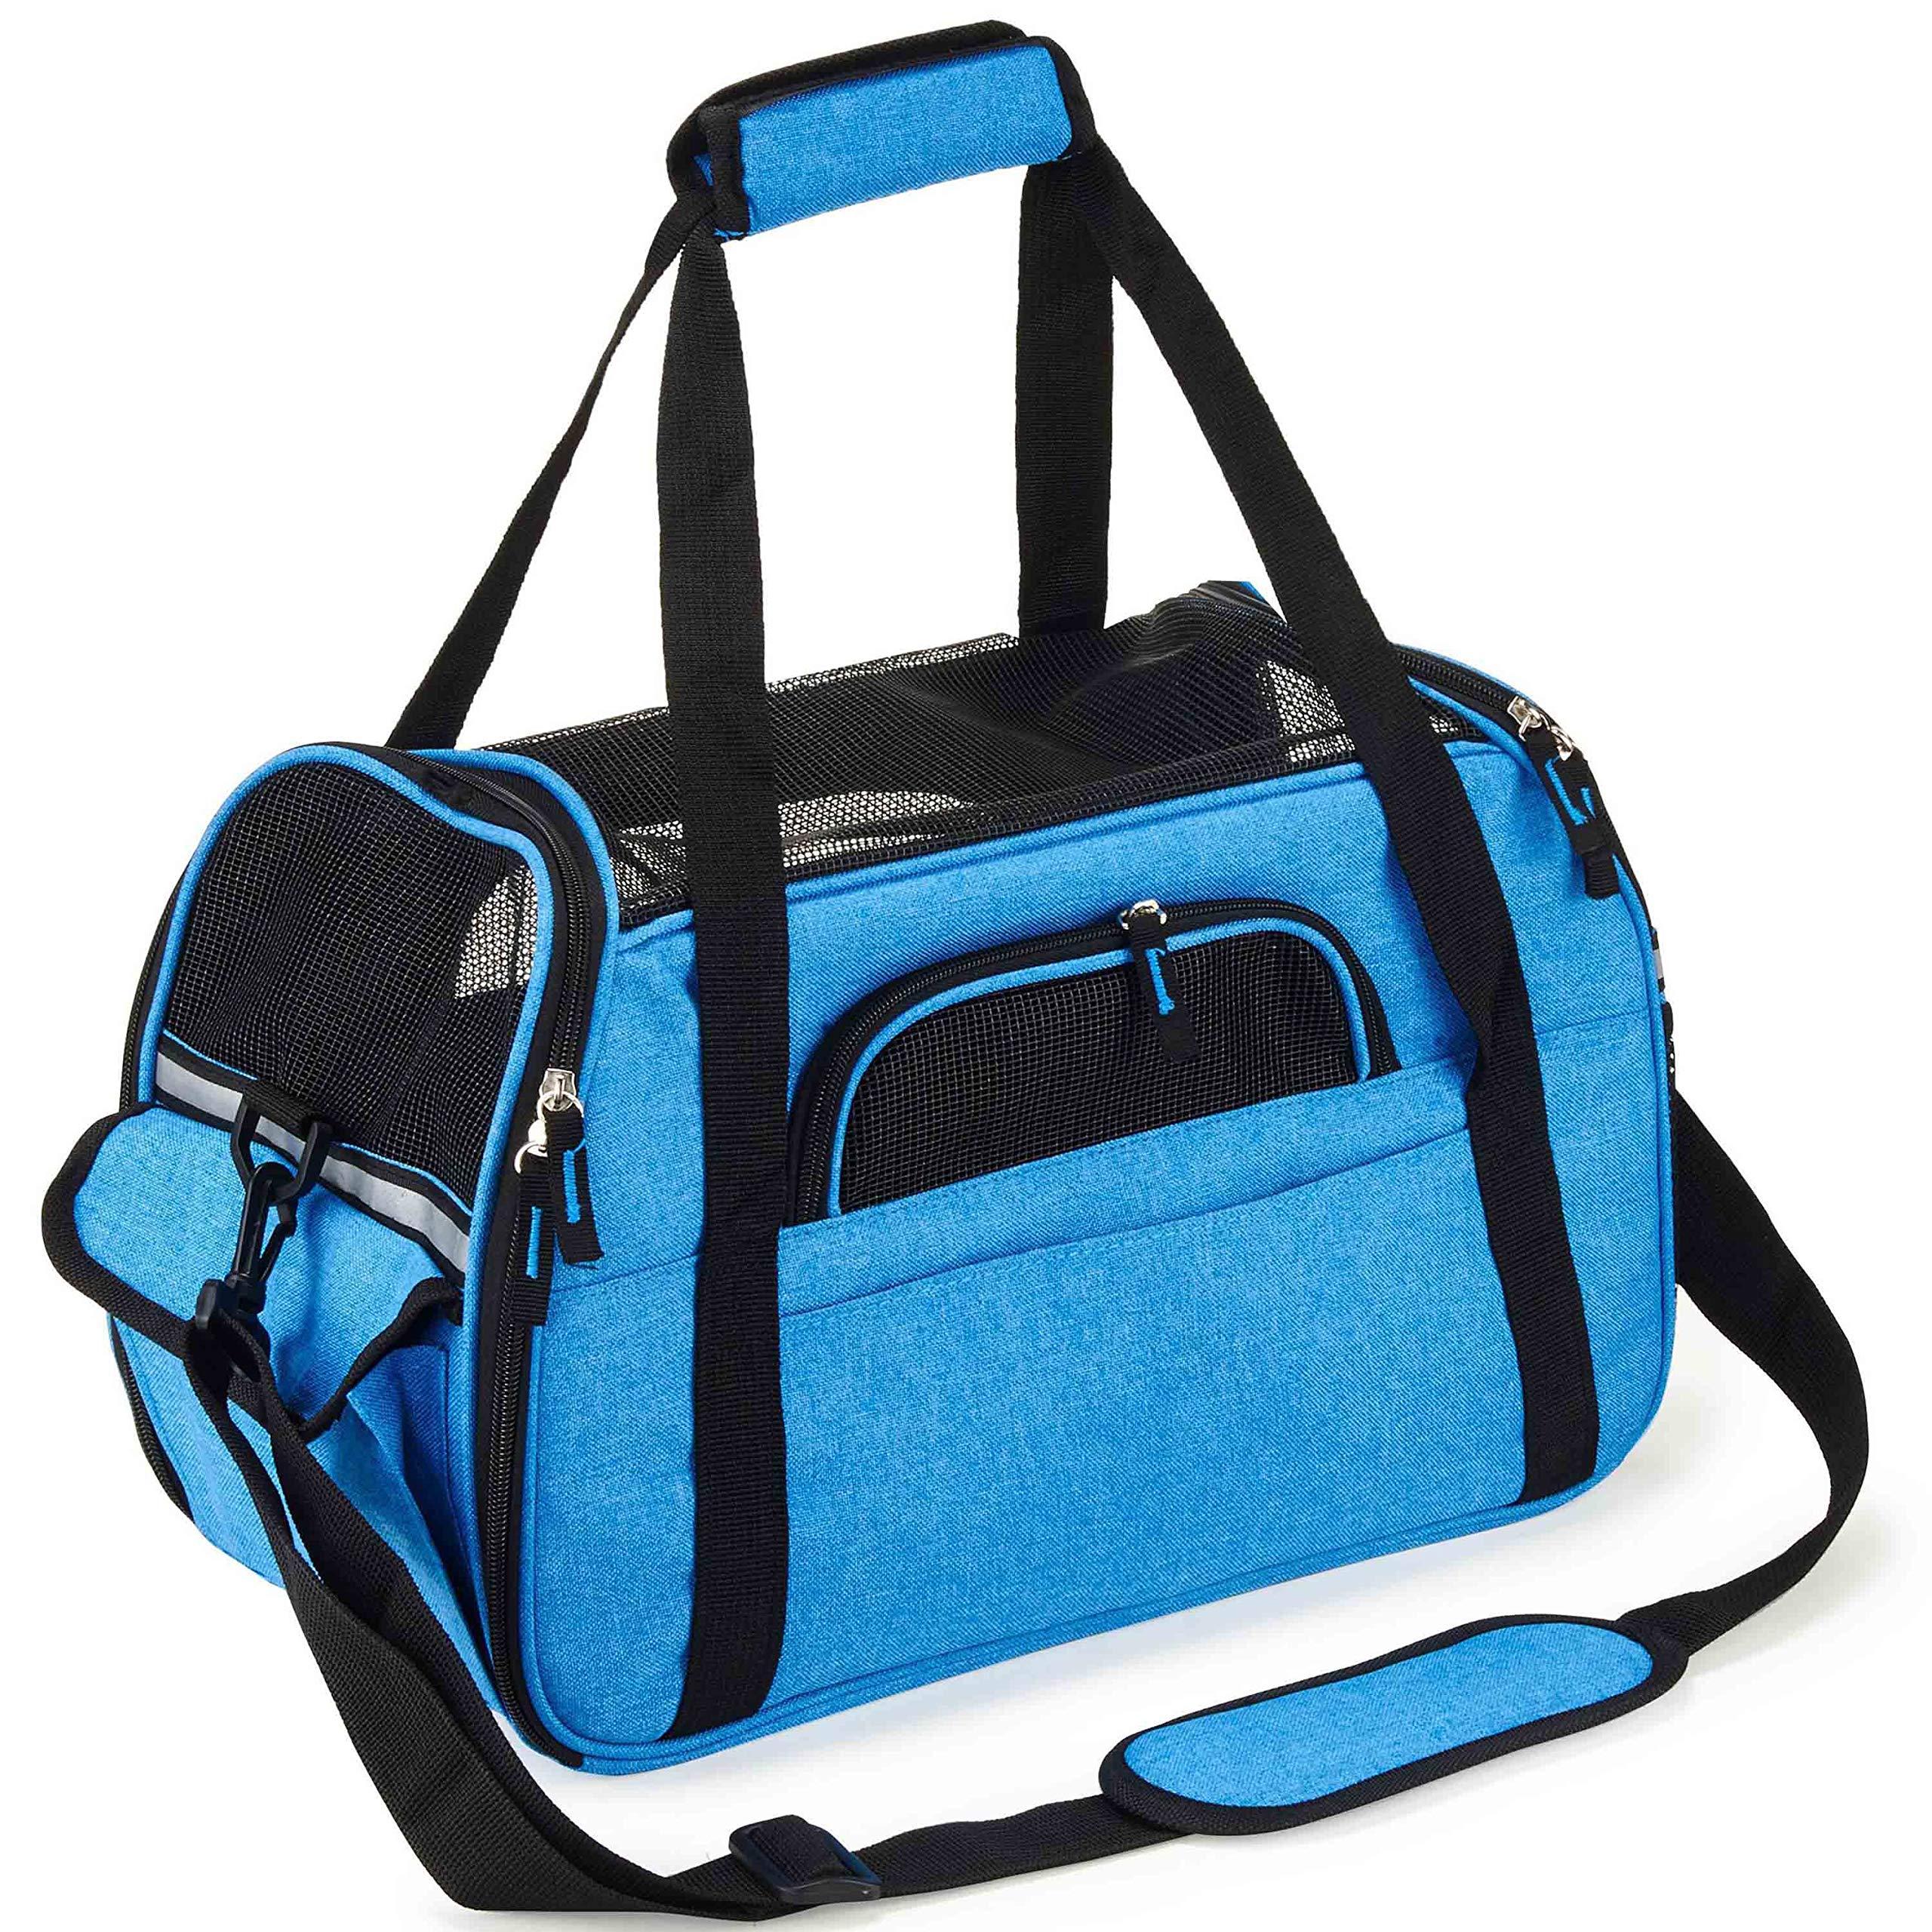 Kaka mall Transportín Perro Gato Transpirable Plegable Pet Carrier Impermeable Bolso de Hombro Acolchado Suave Viaje Avion Tren o Auto por Pequeños Mascota (Azul, L): Amazon.es: Productos para mascotas